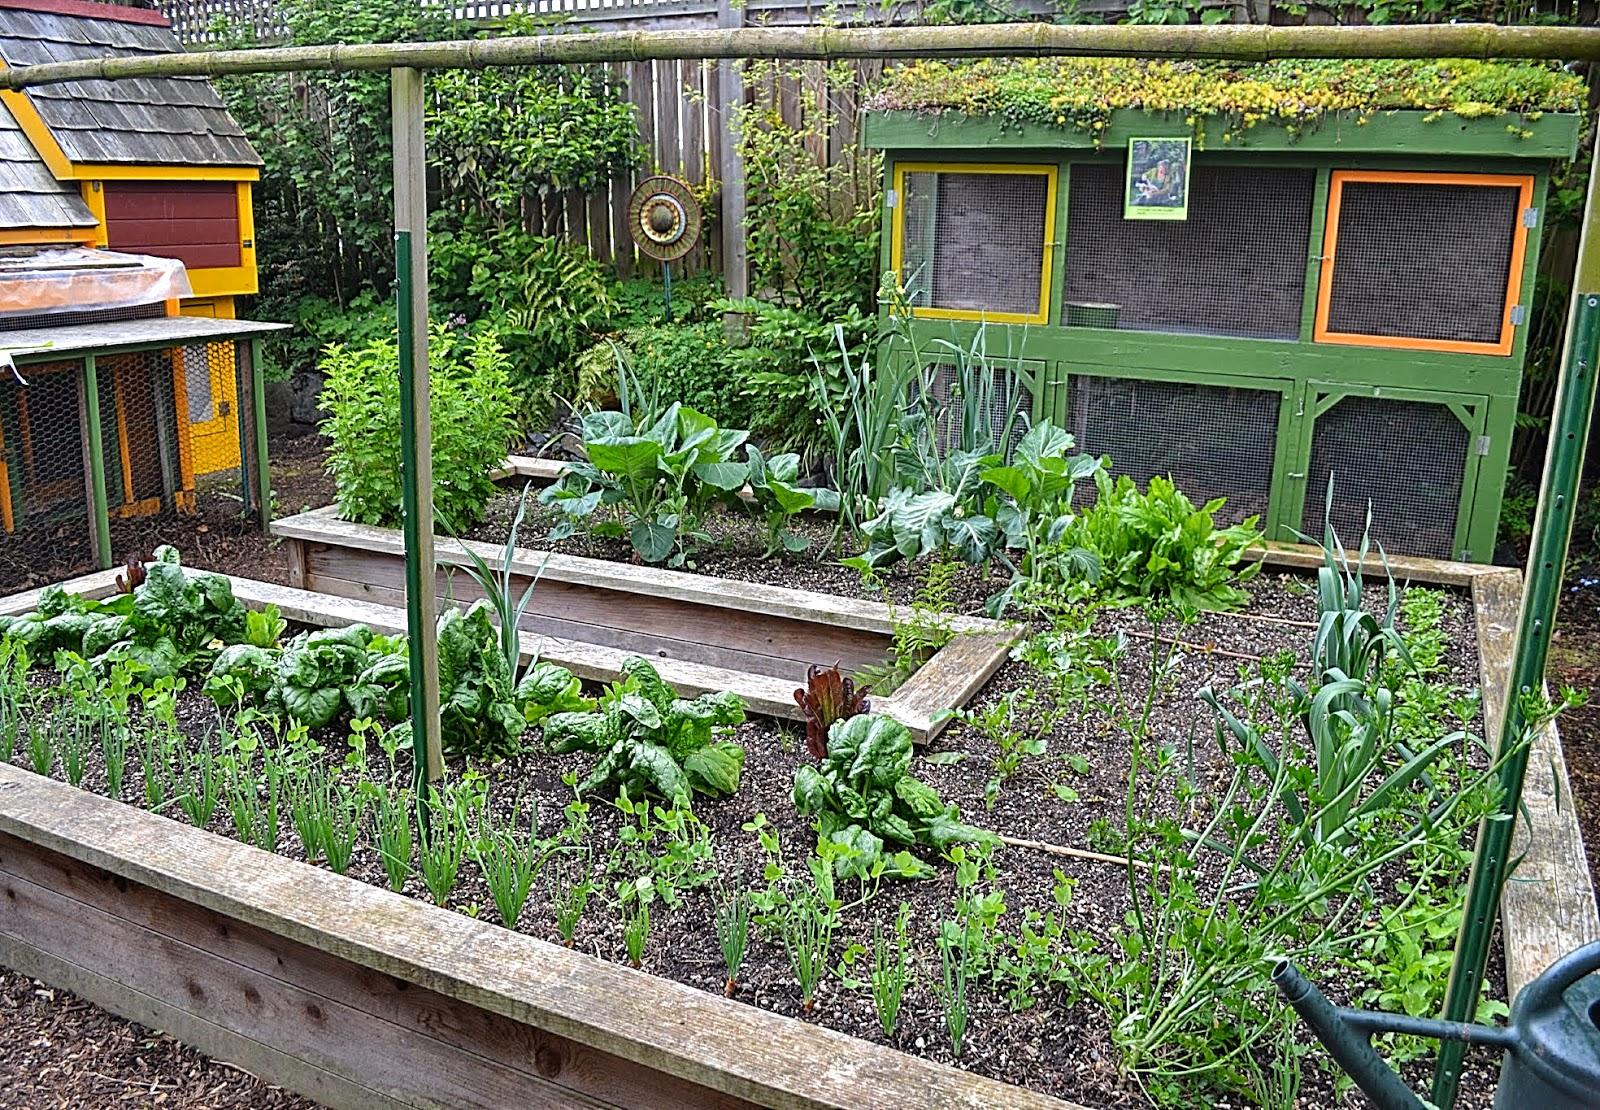 Kitchen Garden Fence The Outlaw Gardener The Garden Of Jennifer And Elroy Carlson